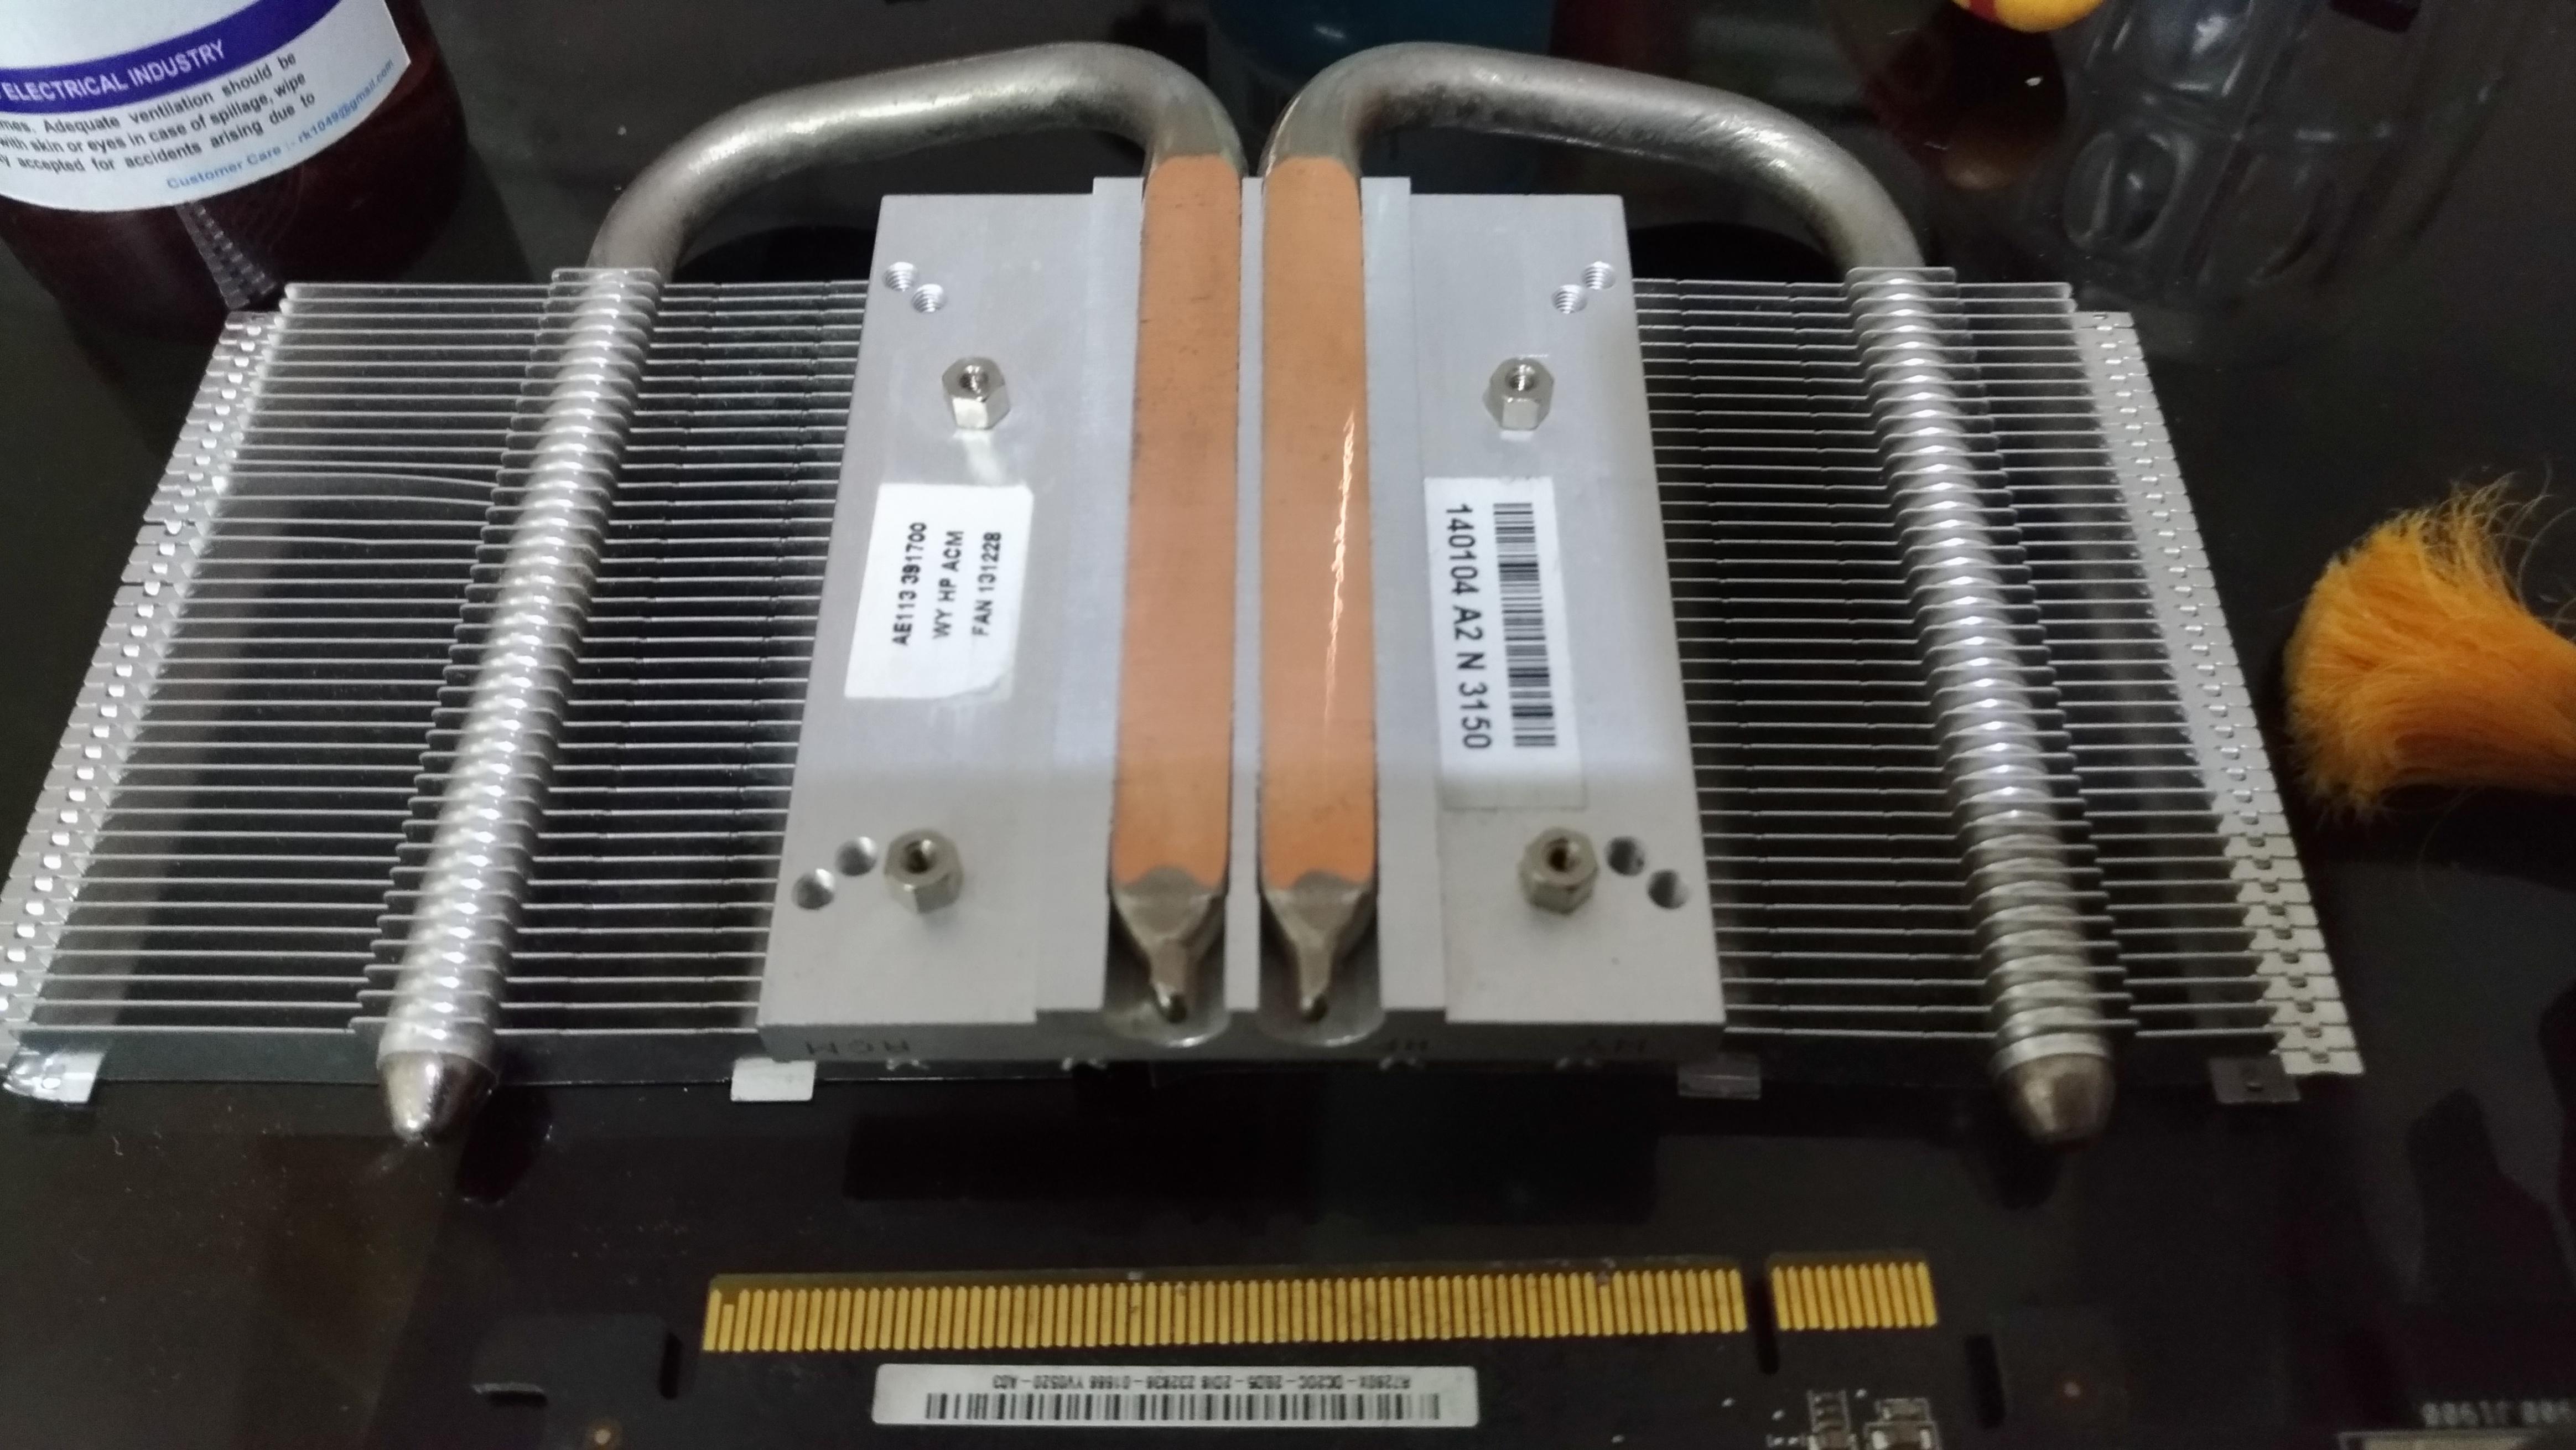 P_20180831_191043_vHDR_Auto.jpg